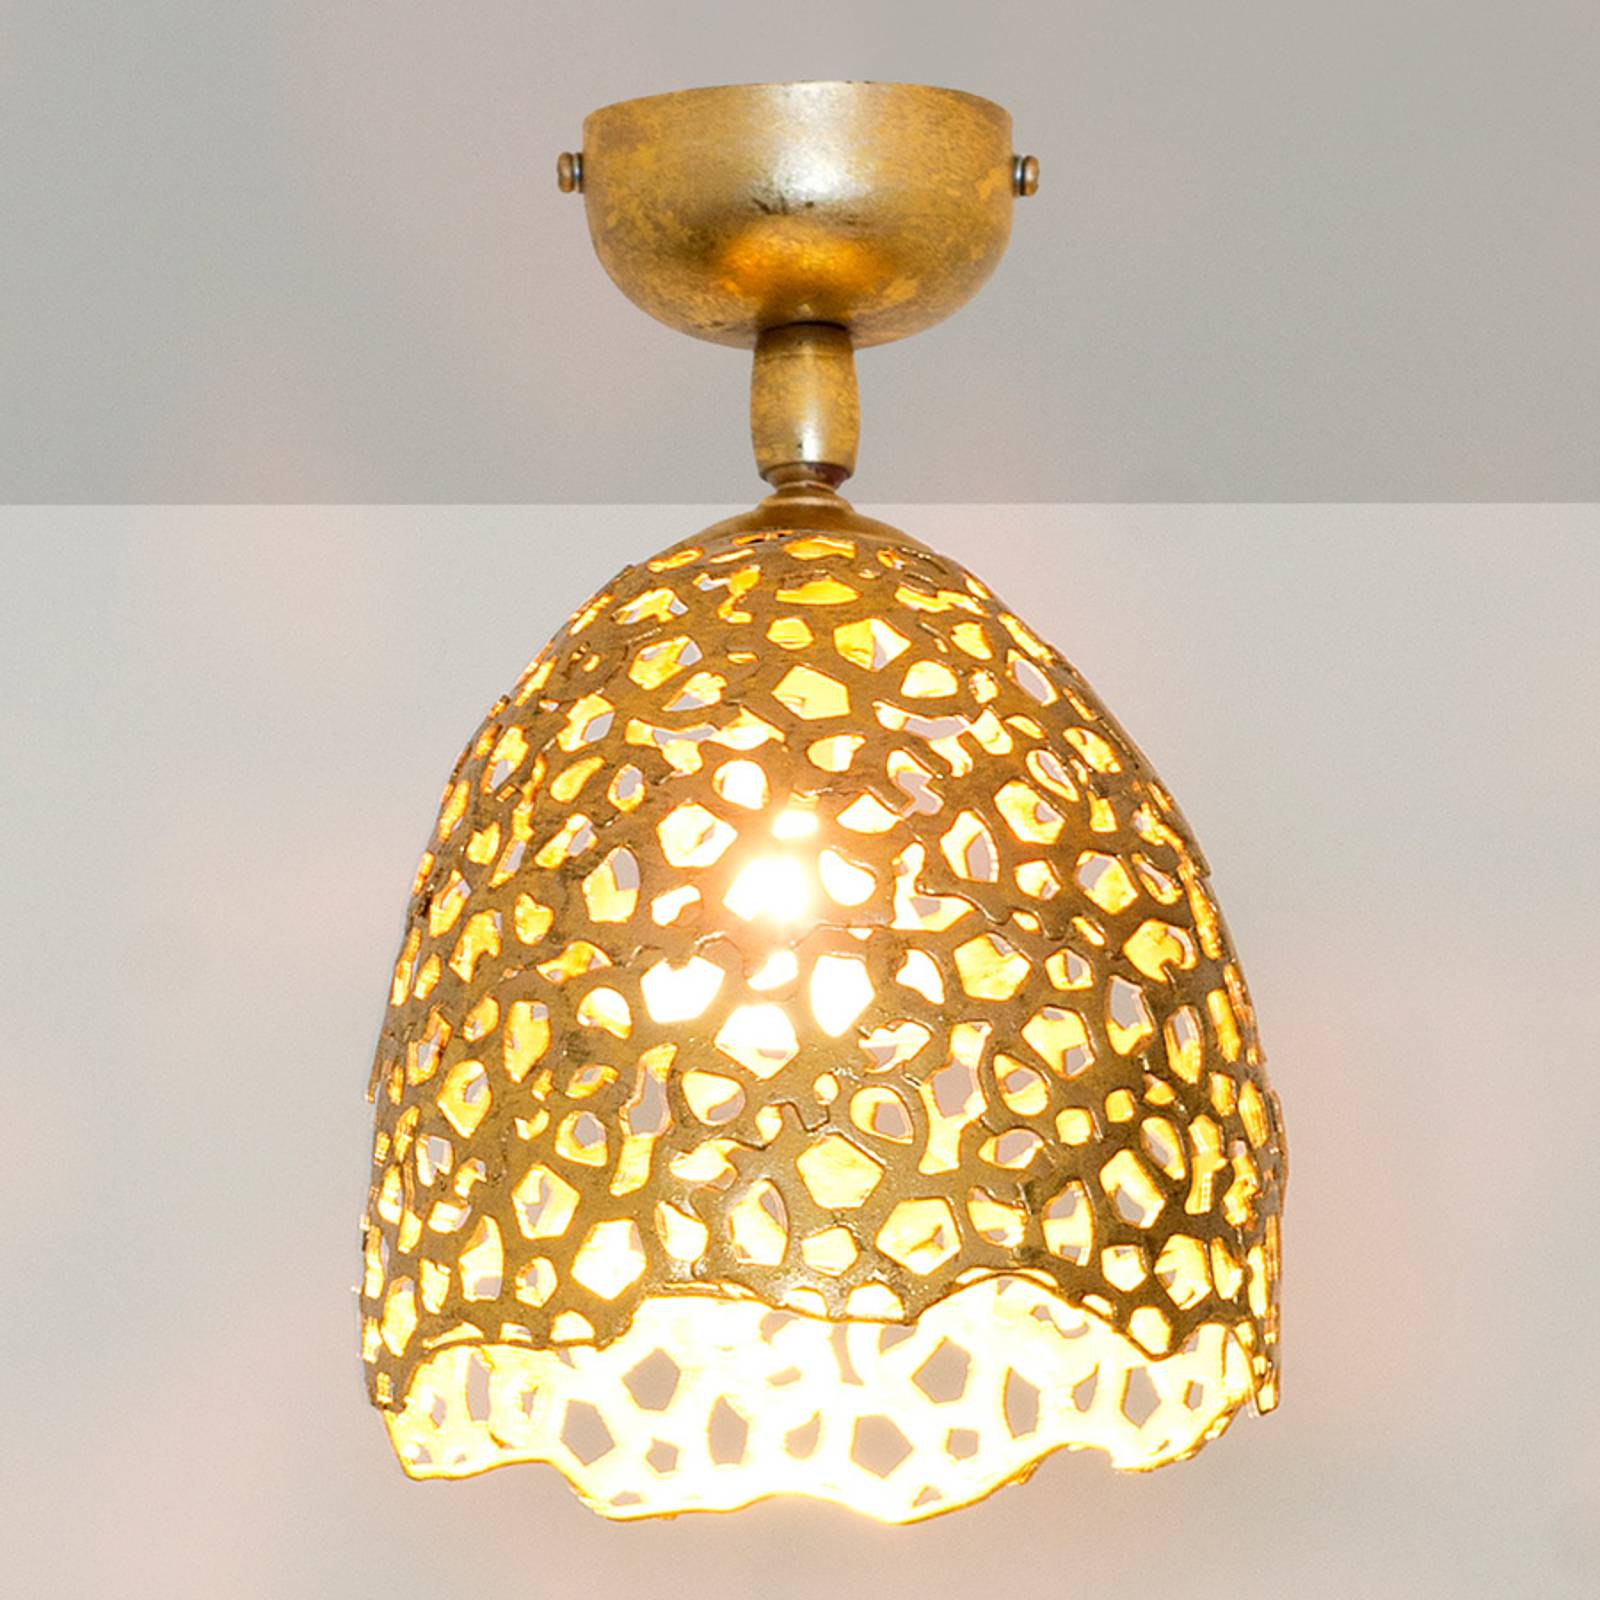 Girevole - ażurowa lampa sufitowa